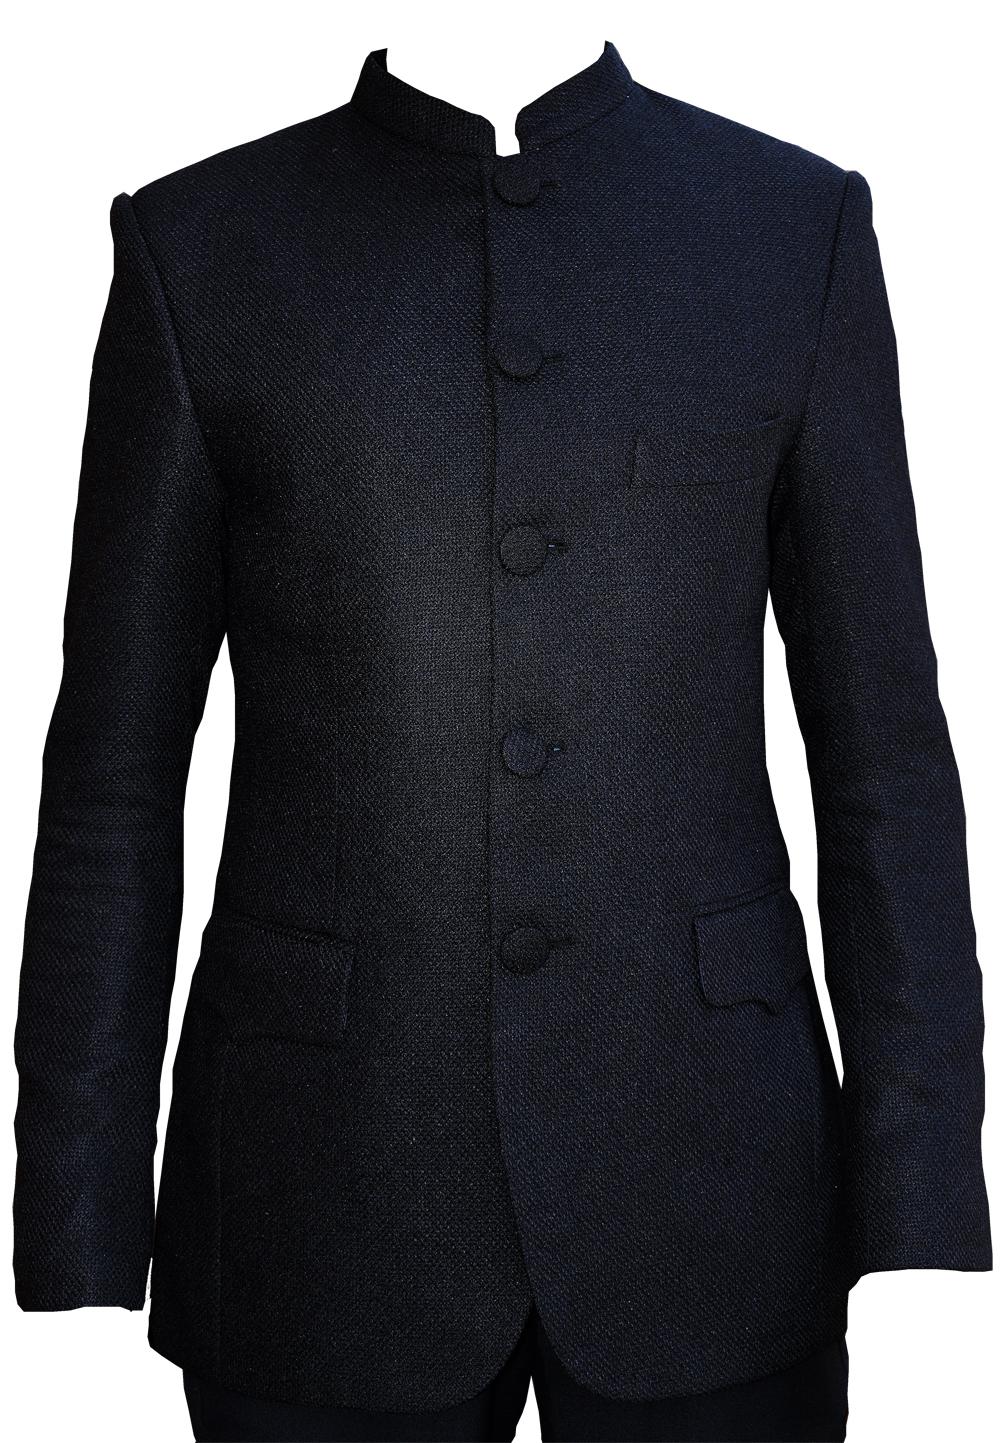 Navy blue interview blazer for men Kenya